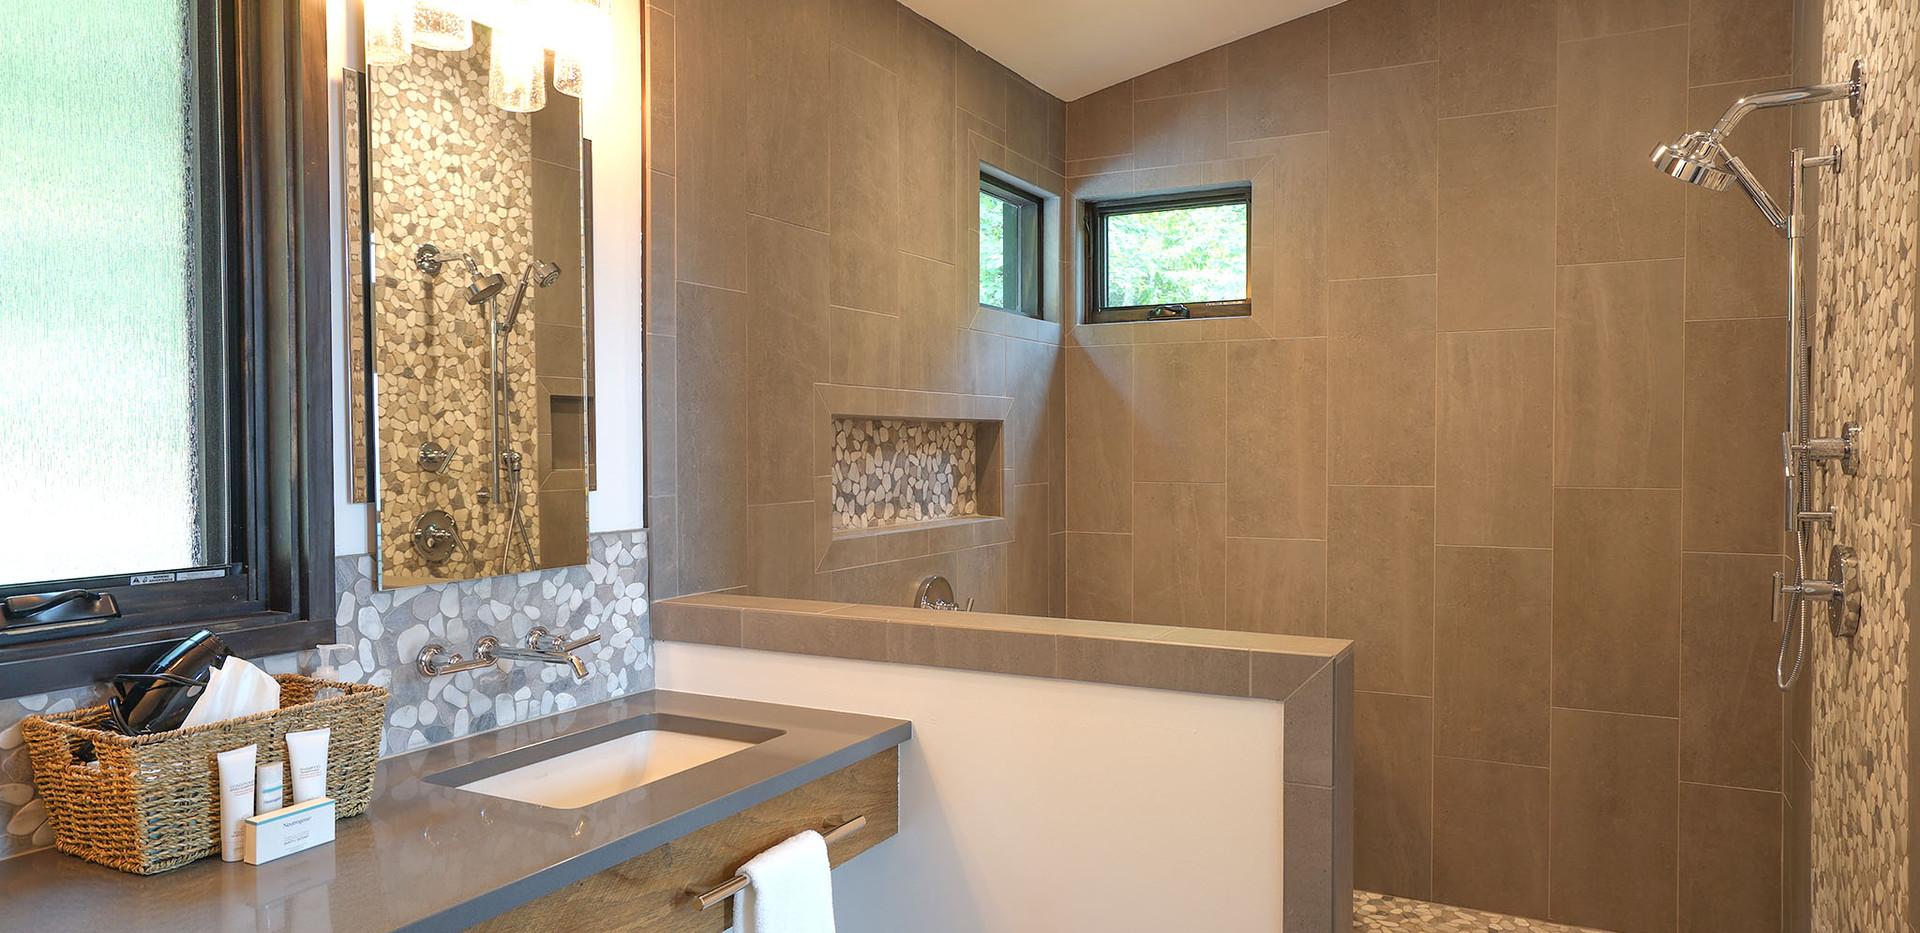 Sunset Falls - master bath shower